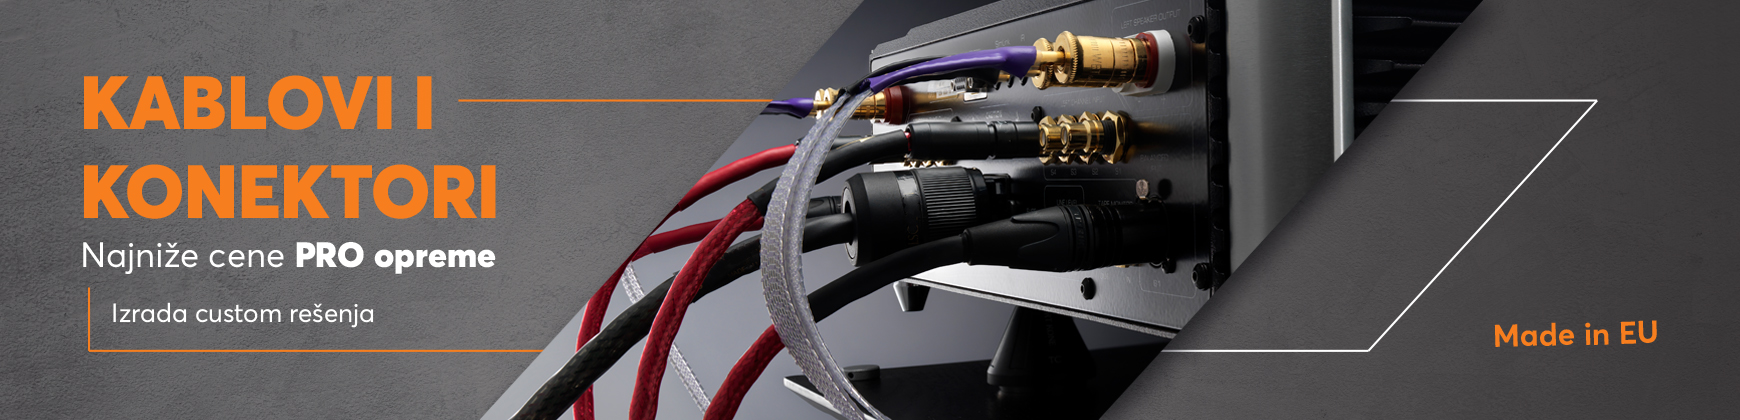 Kablovi i Konektori